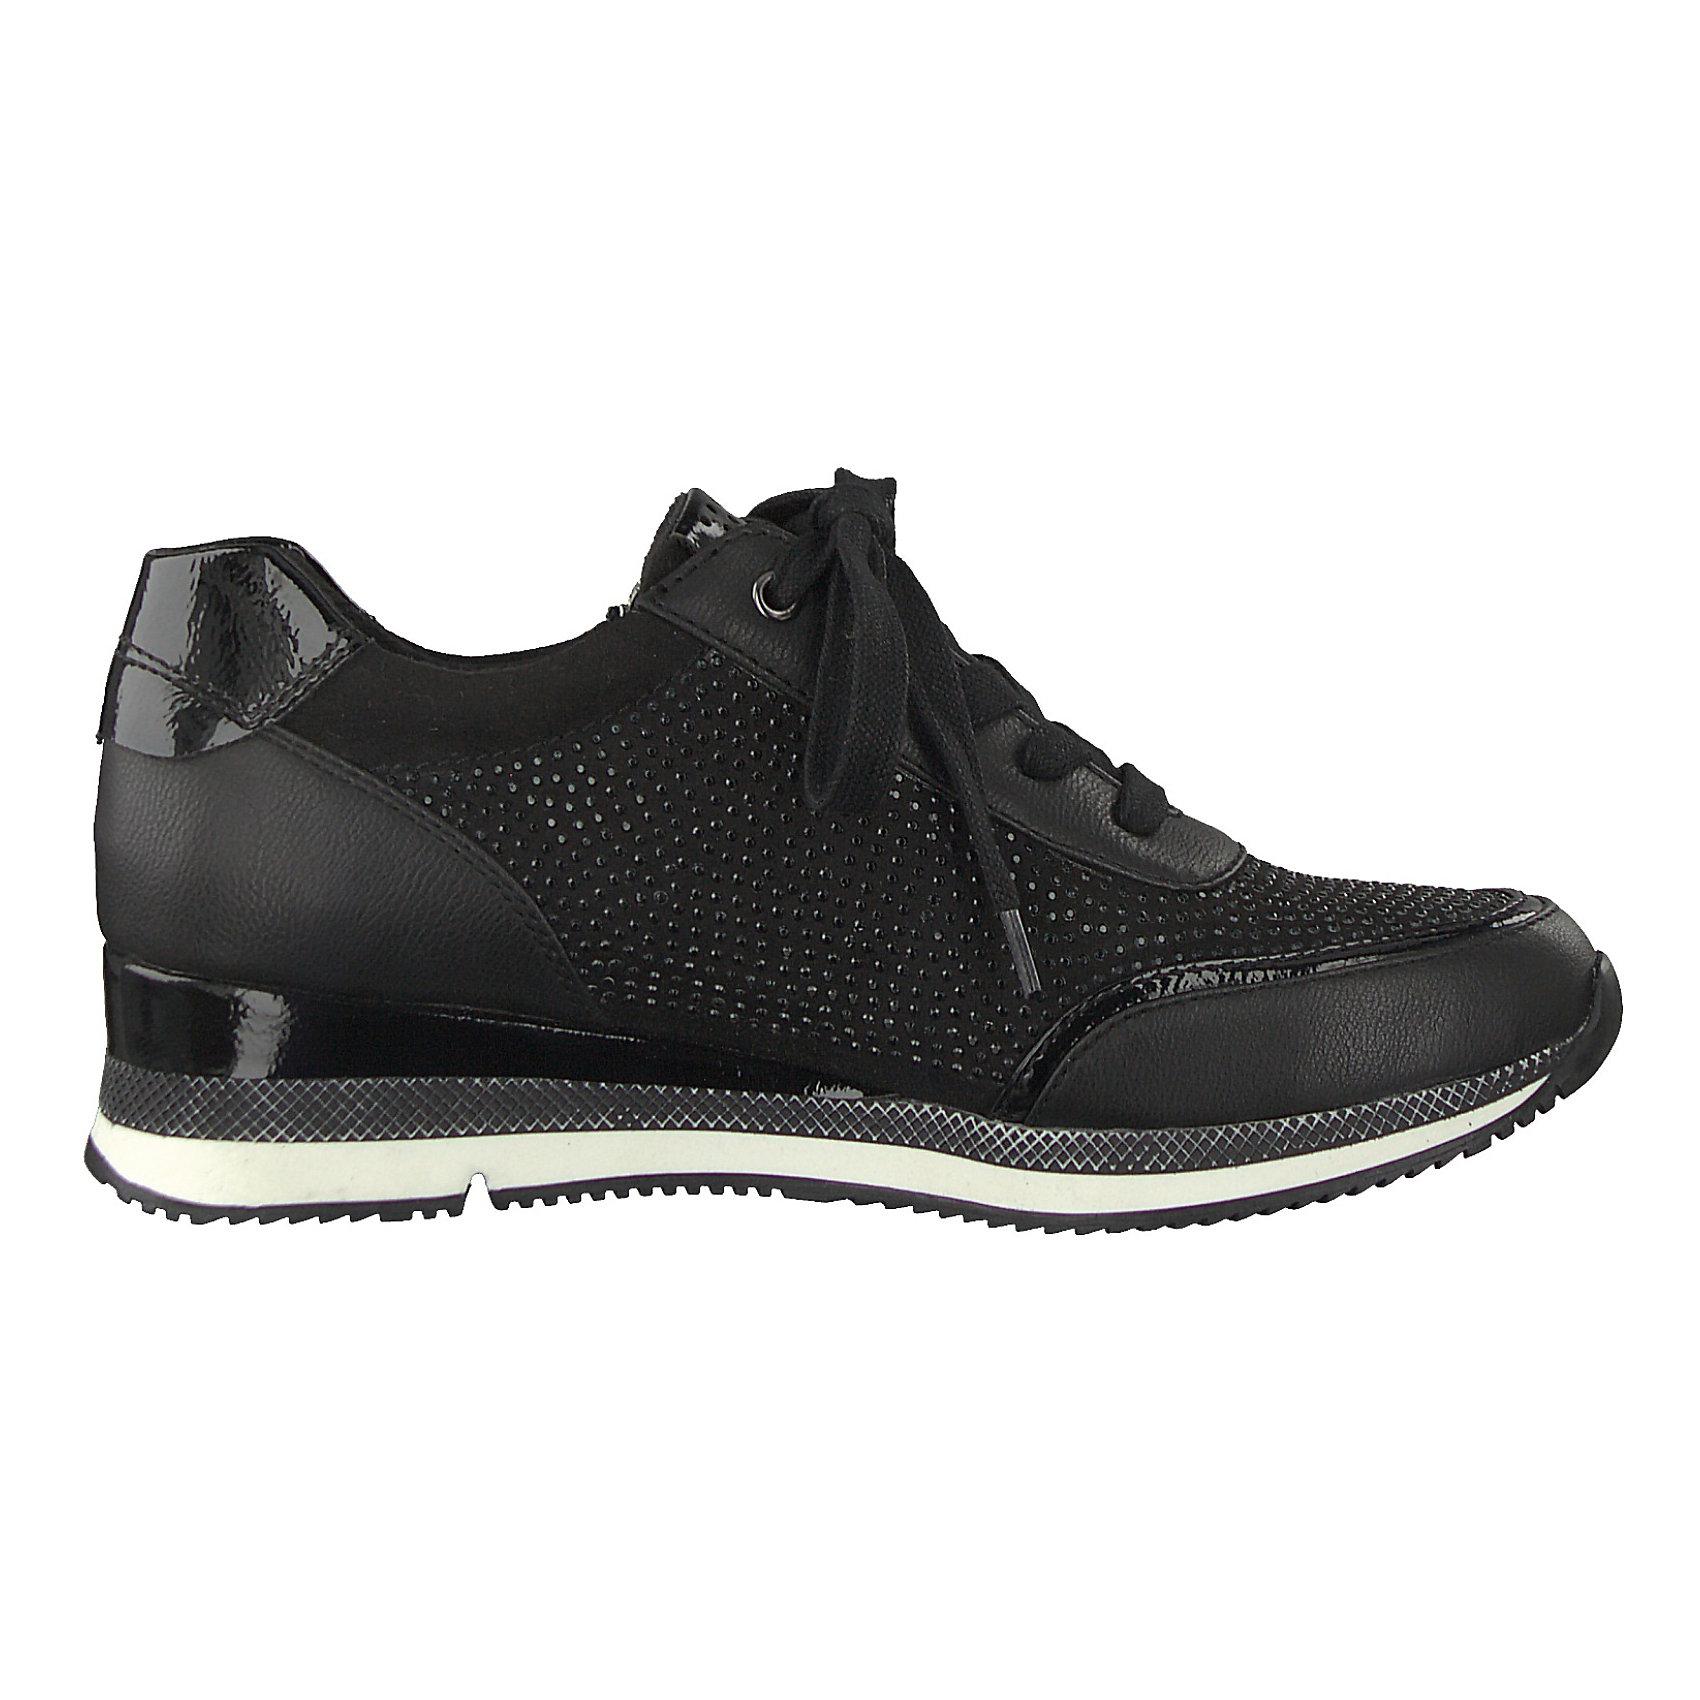 newest e8d98 3dcd1 ... Nike Benassi Benassi Benassi JDI Fanny Pack Mens AO1037-600 Hyper Punch  Grape Sandals Size ...